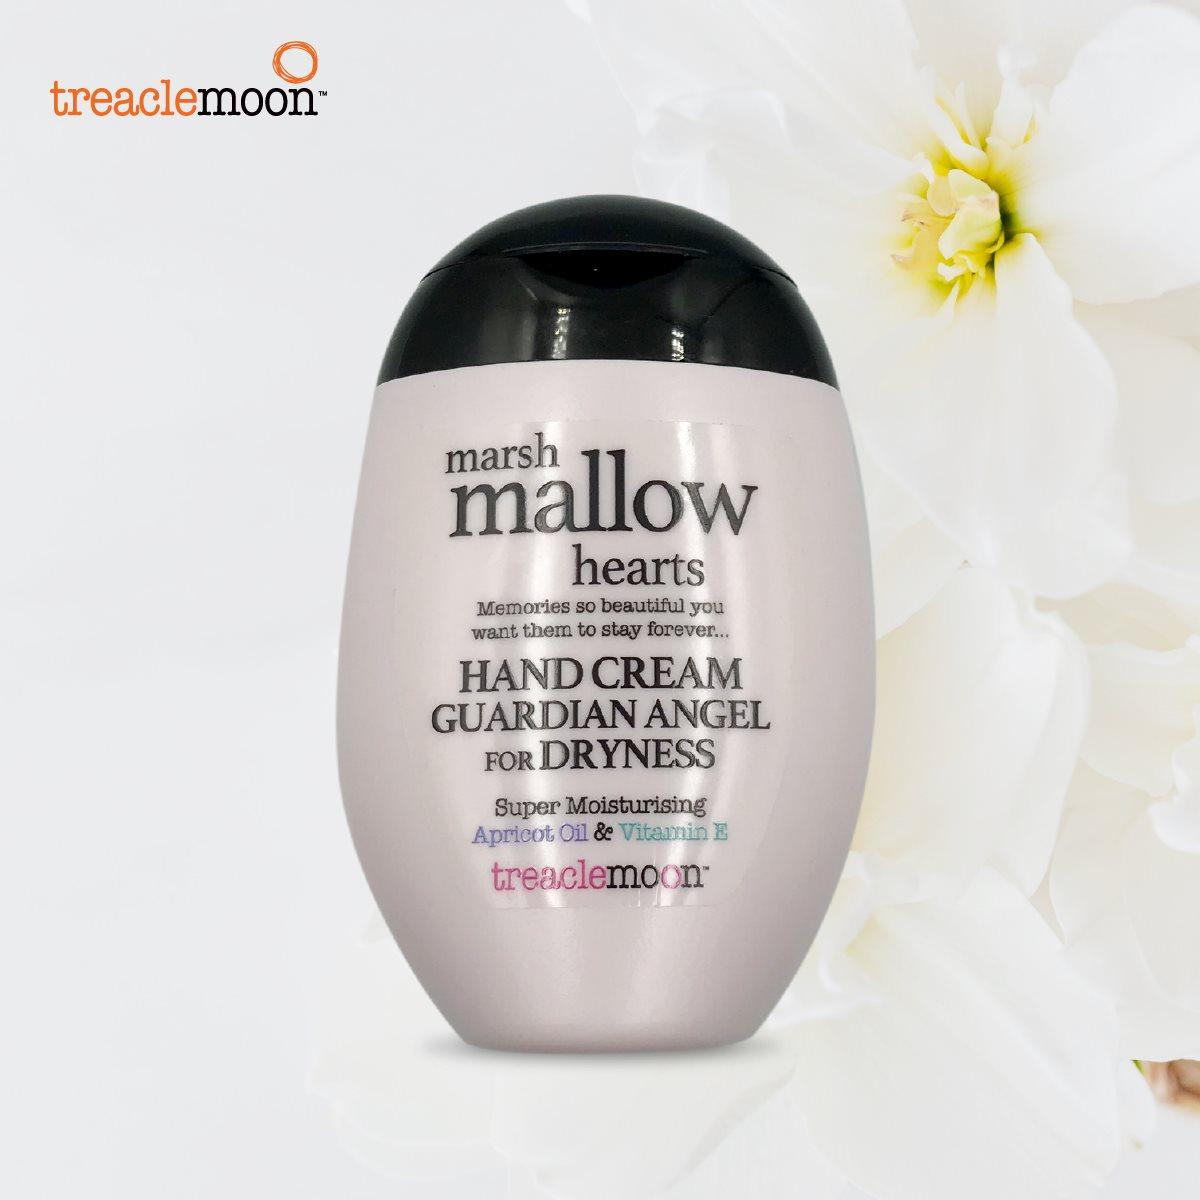 Kem Dưỡng Da Tay Treaclemoon Marshmallow Hearts Hand Cream 75ml